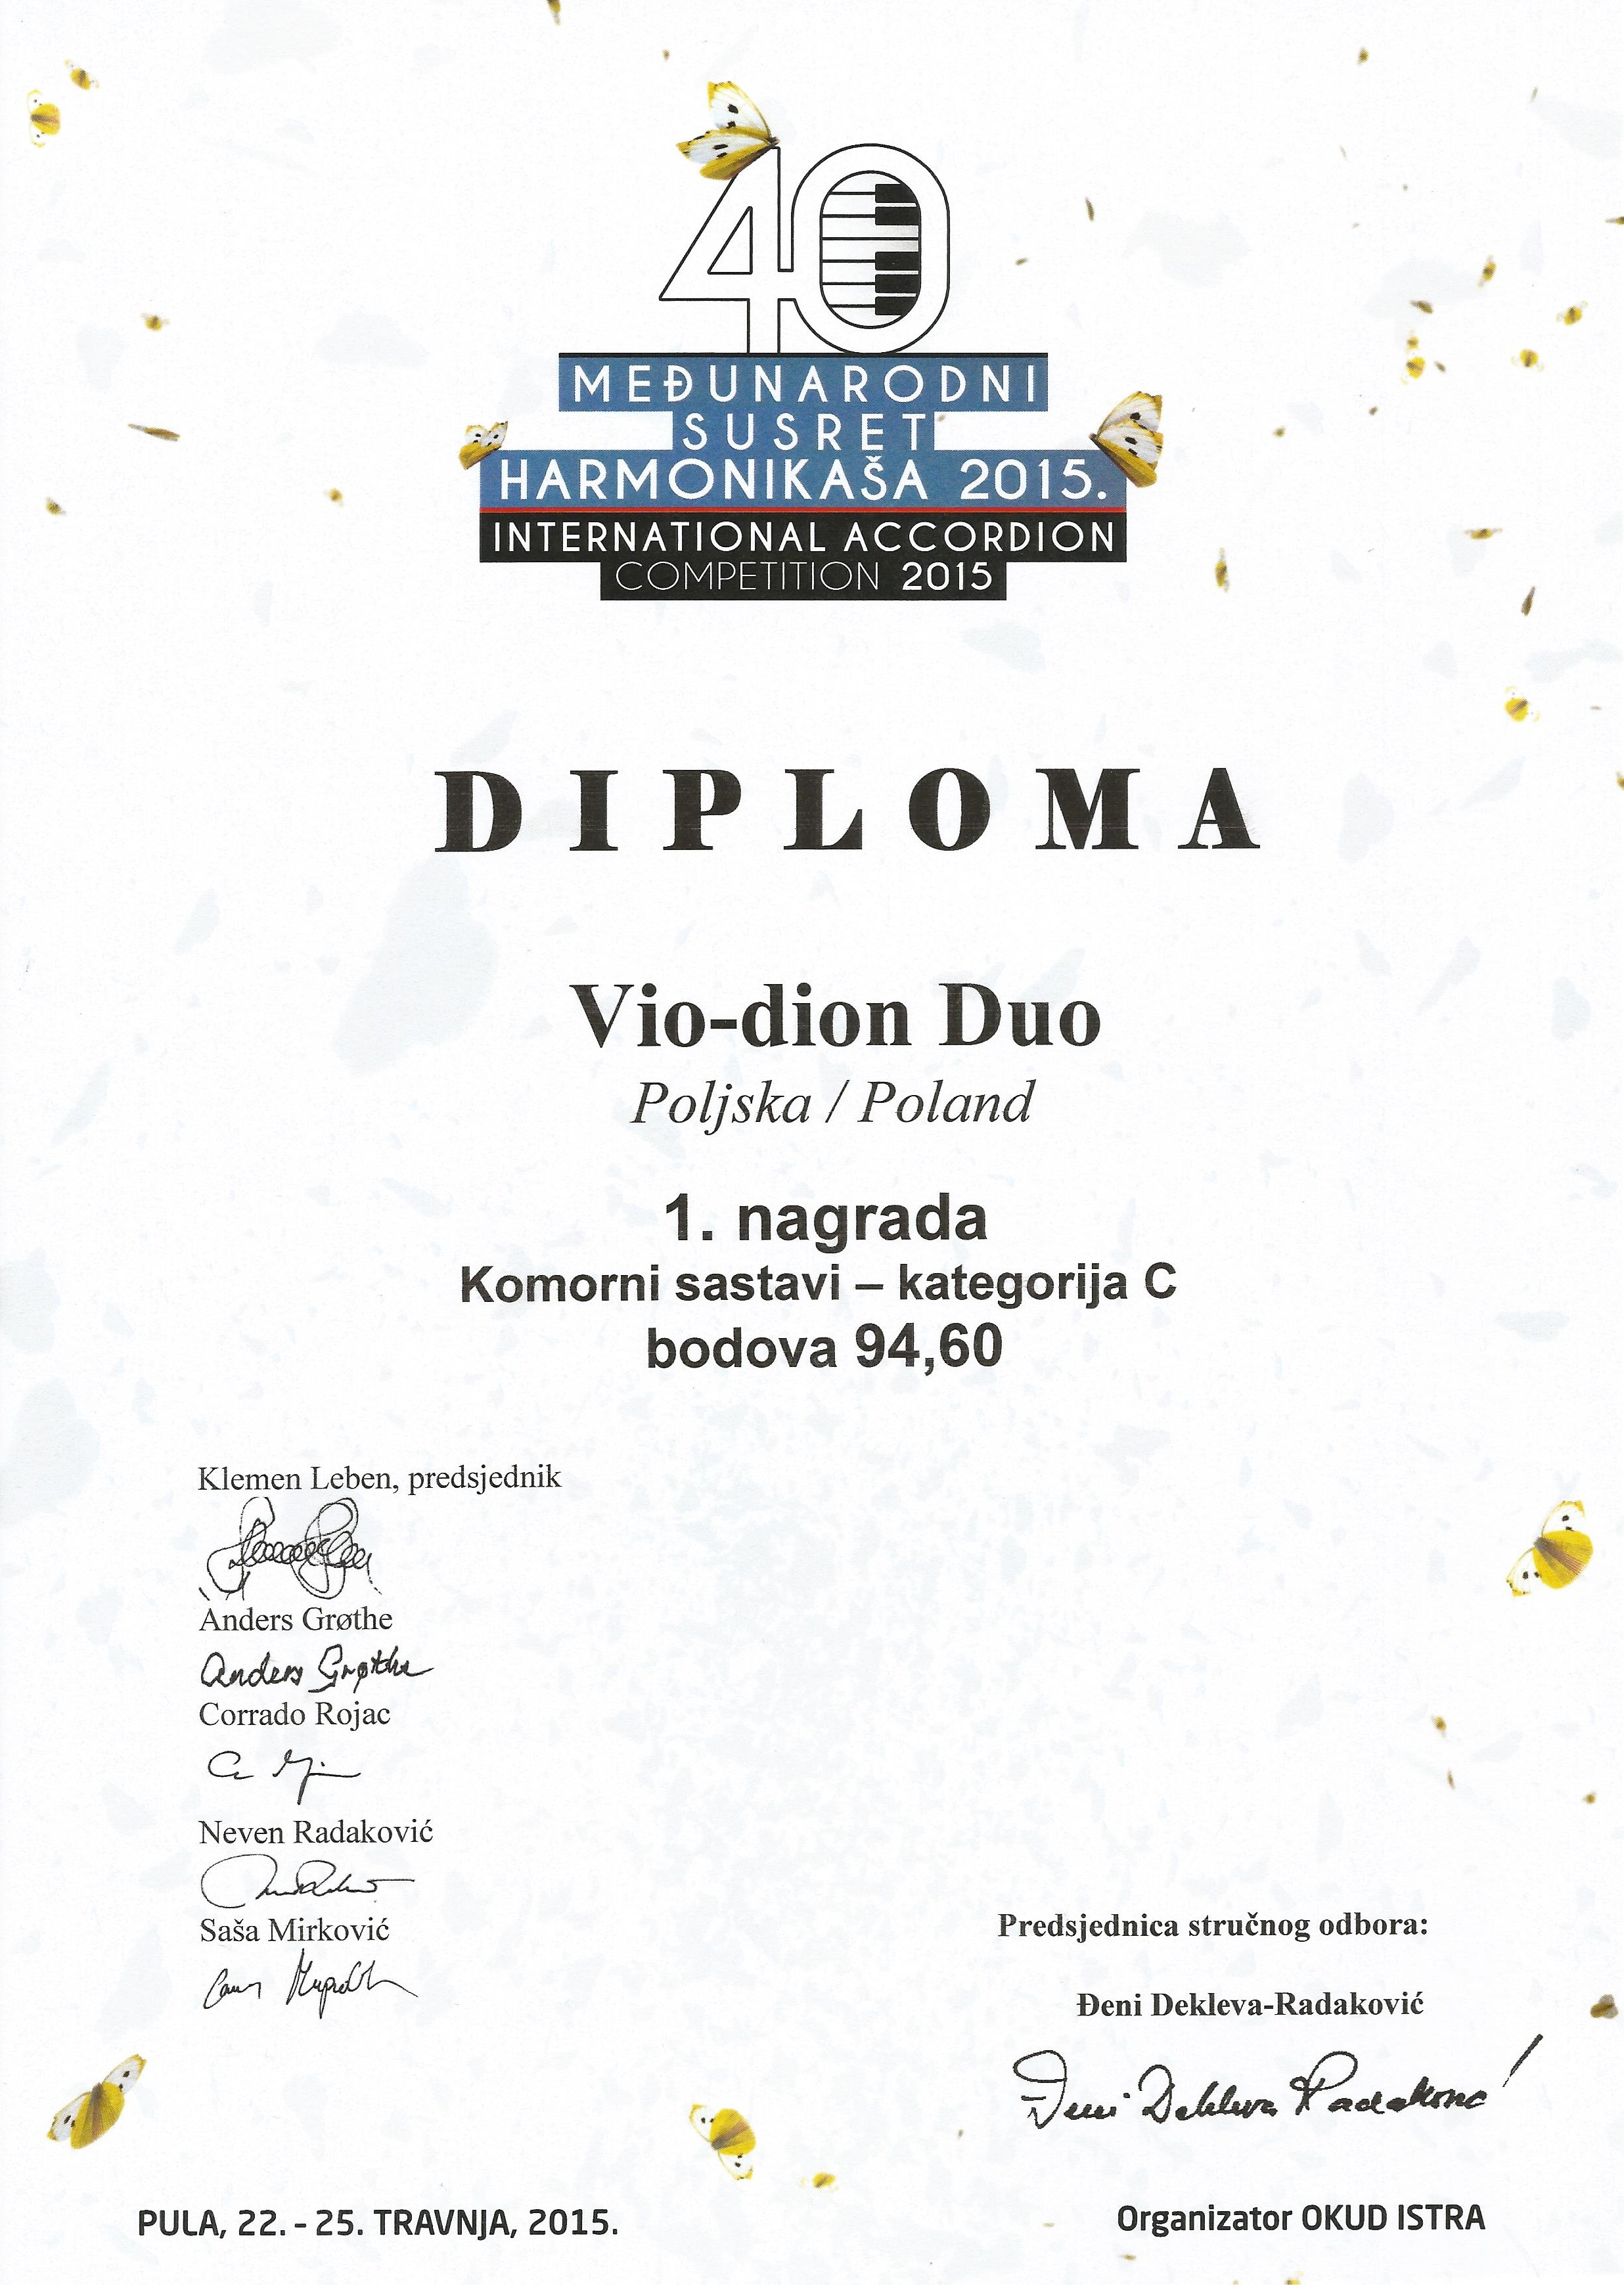 Vio-Dion Duo_Pula I nagroda_kat. kameralnej C